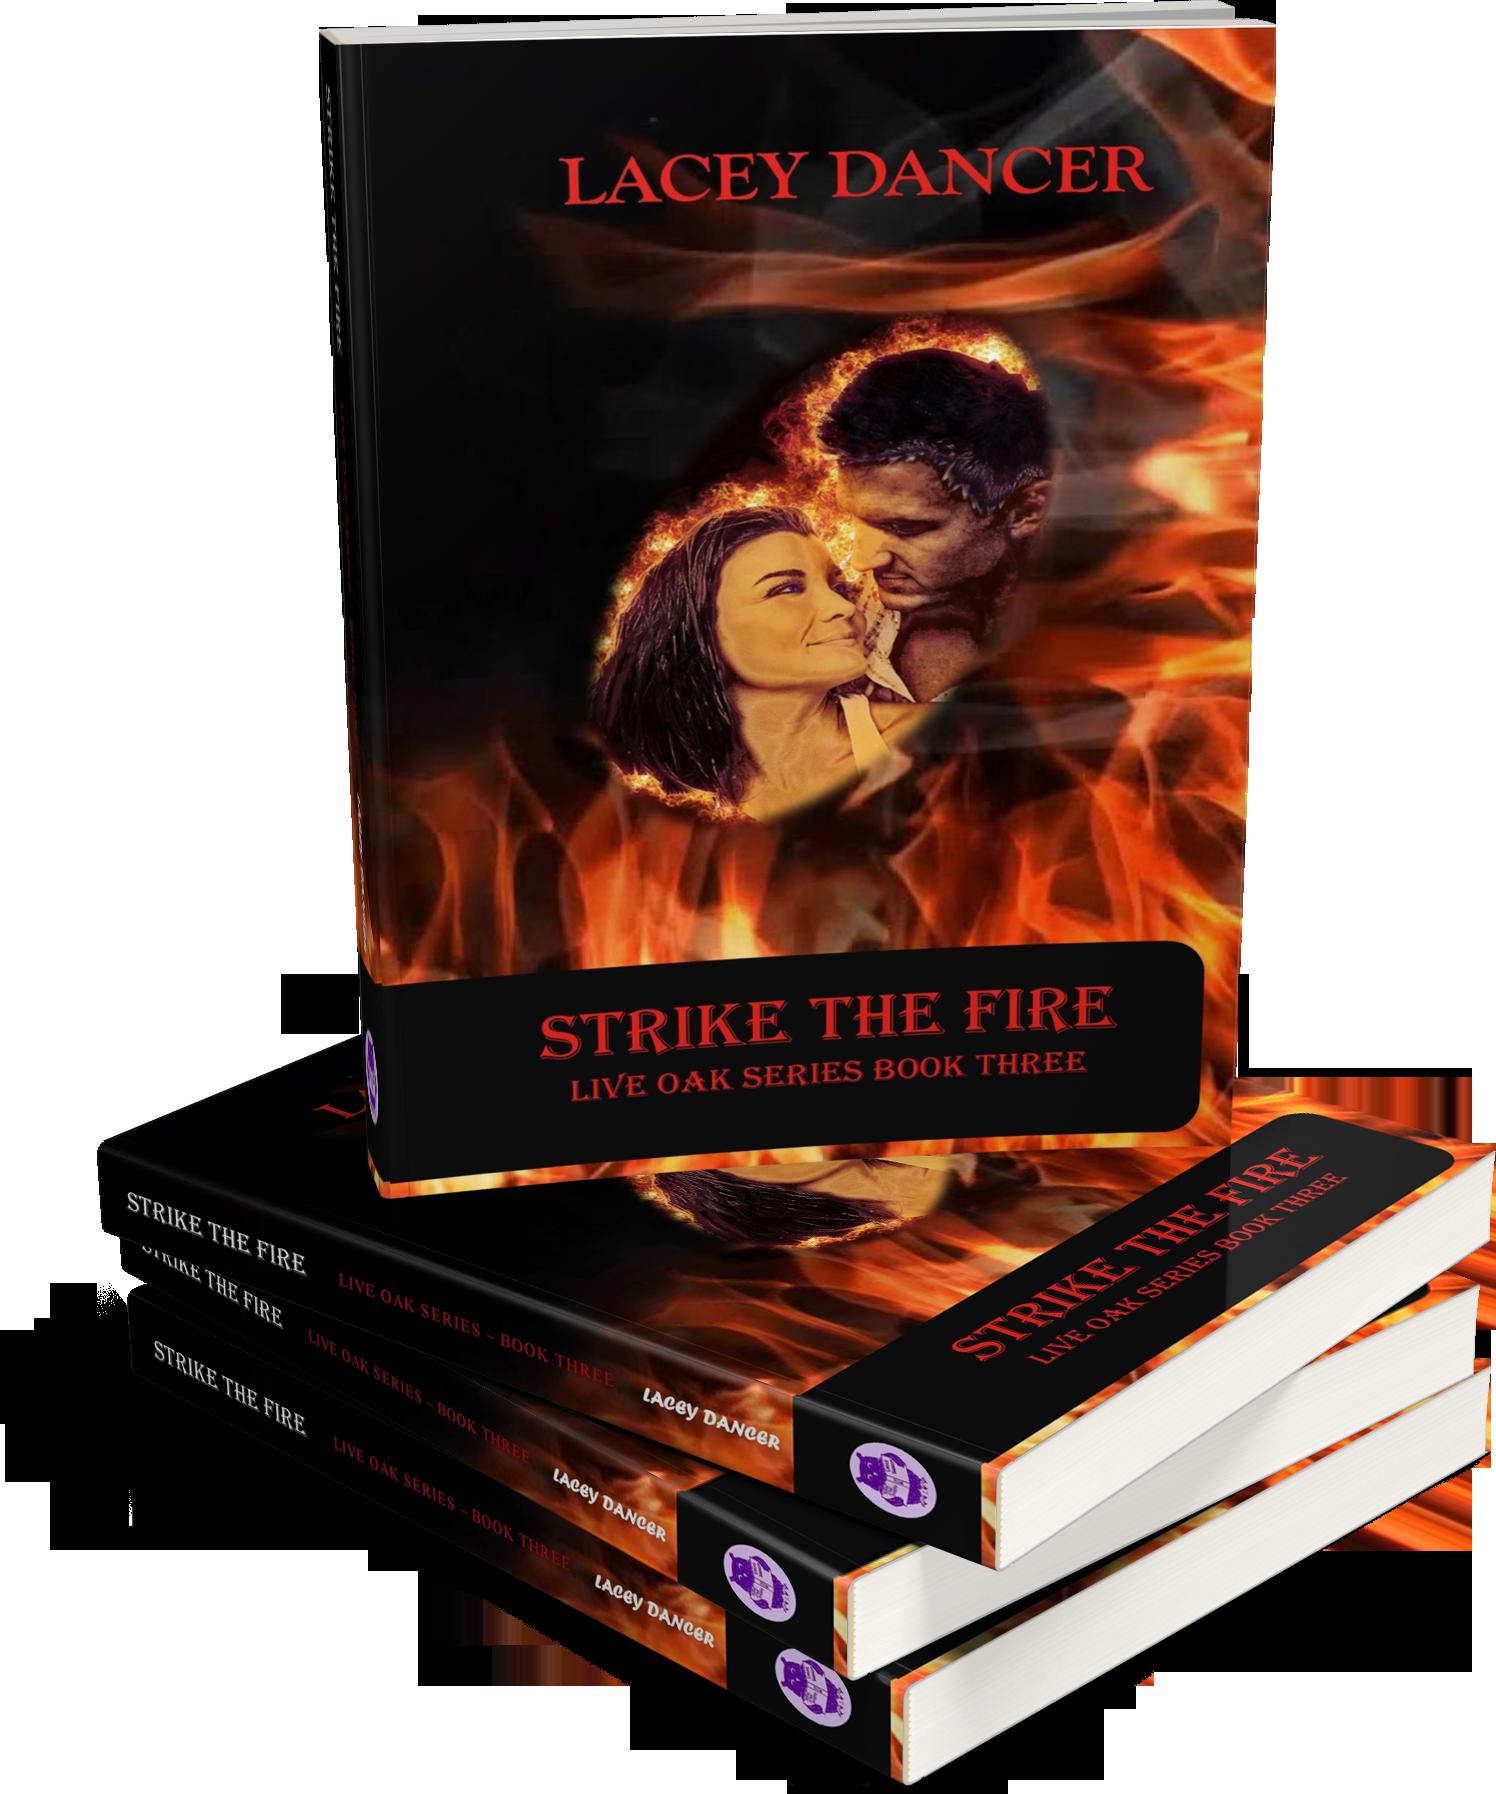 Lacey Dancer